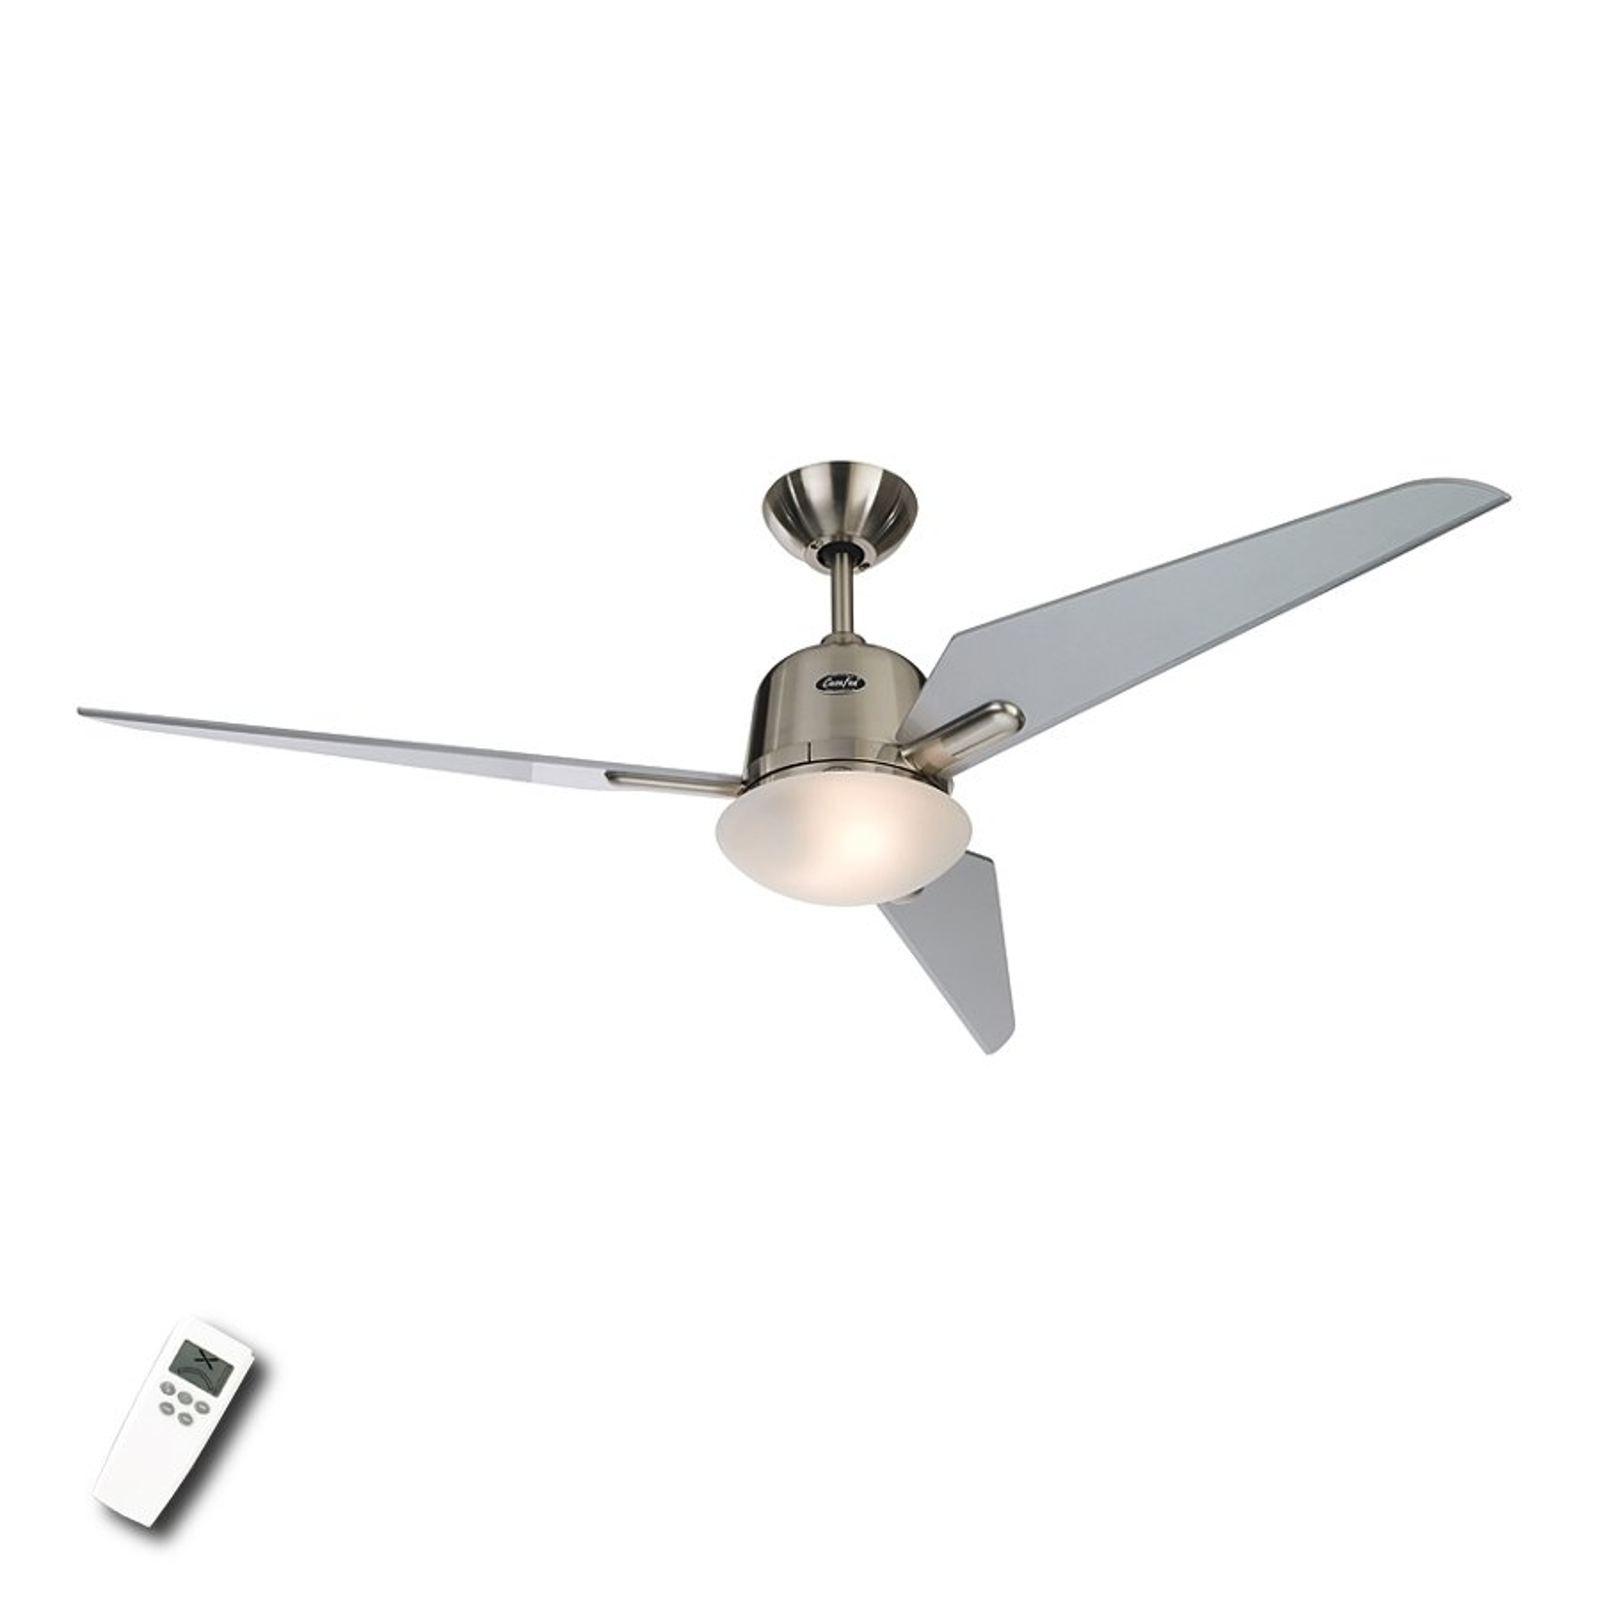 Kattotuuletin Eco Aviatos hopea 132 cm